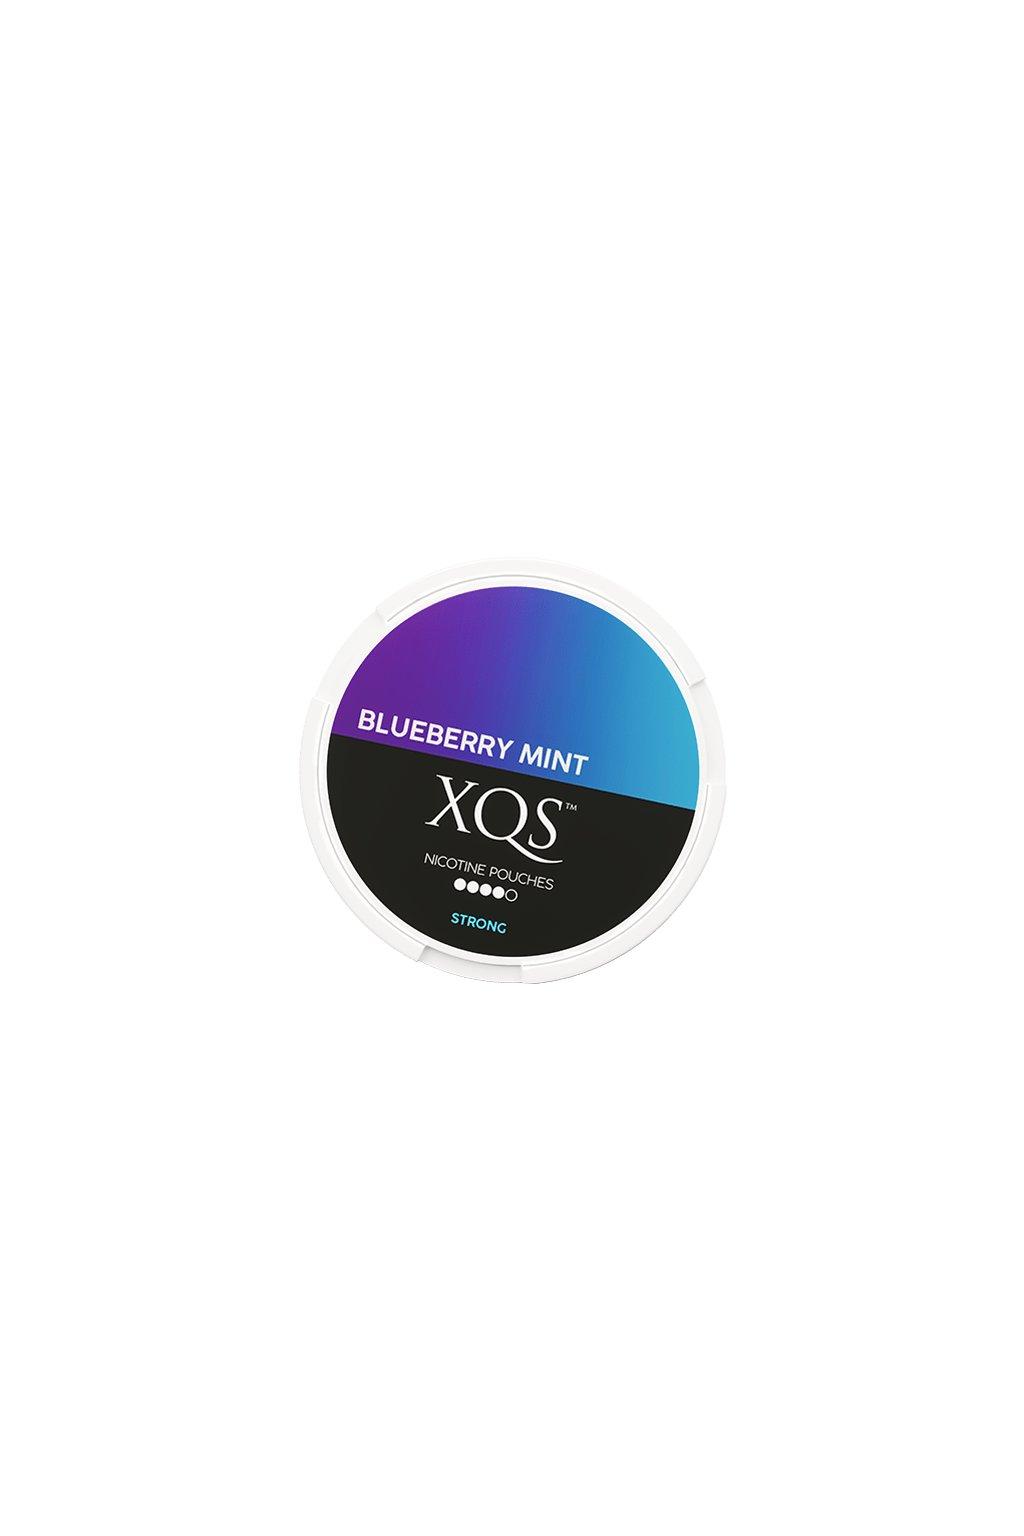 xqs blueberry mint slim extra strong nikotinove sacky nicopods